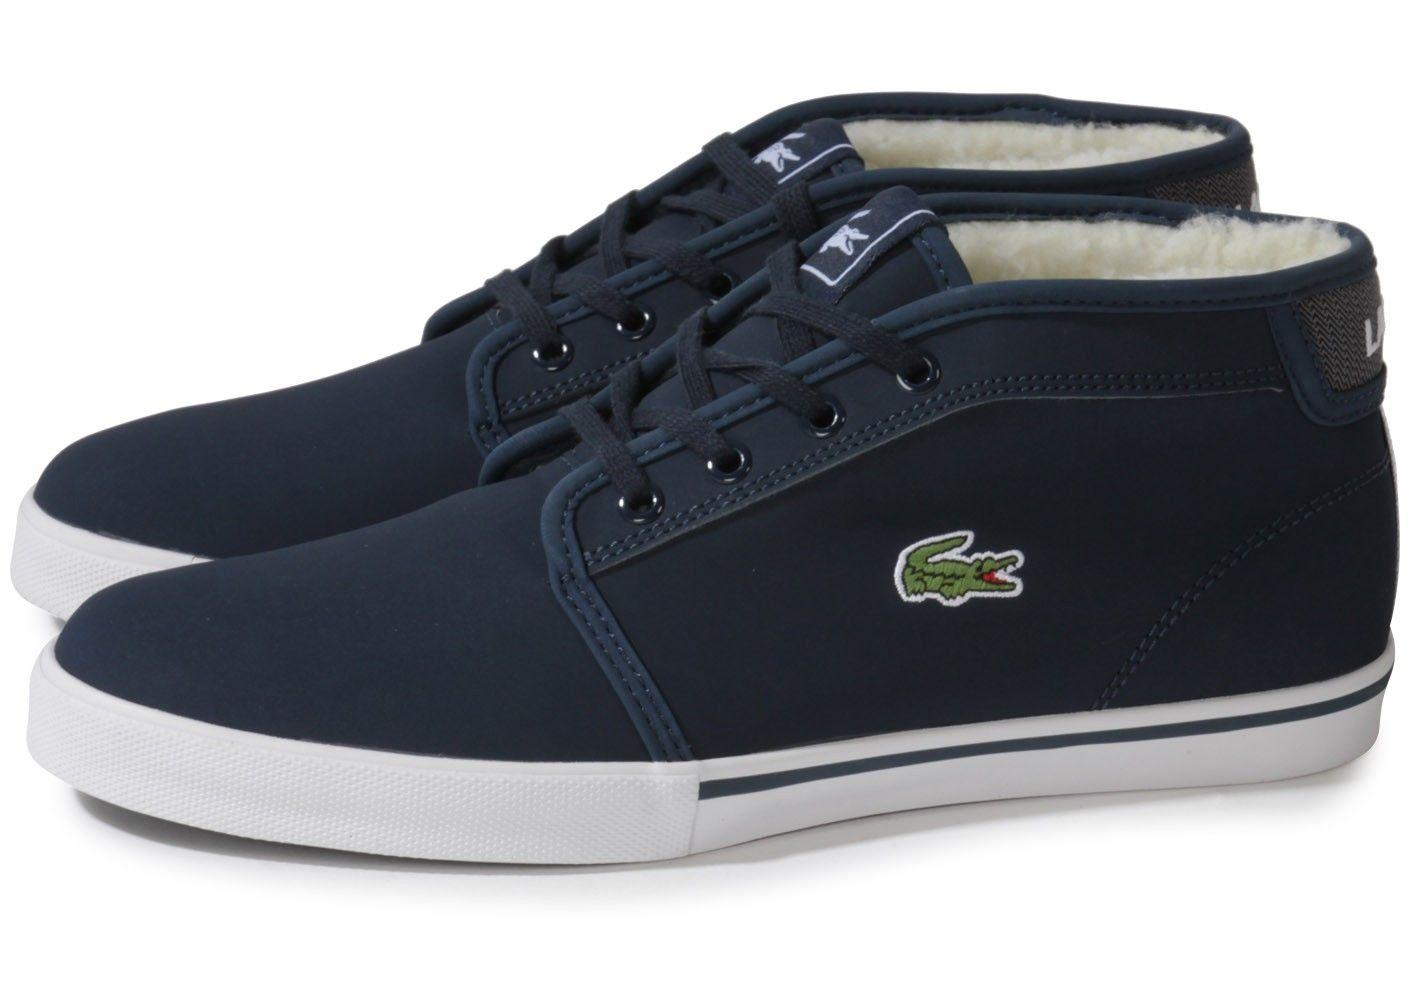 b81f9a1b6ce Chaussures Lacoste Homme Noir